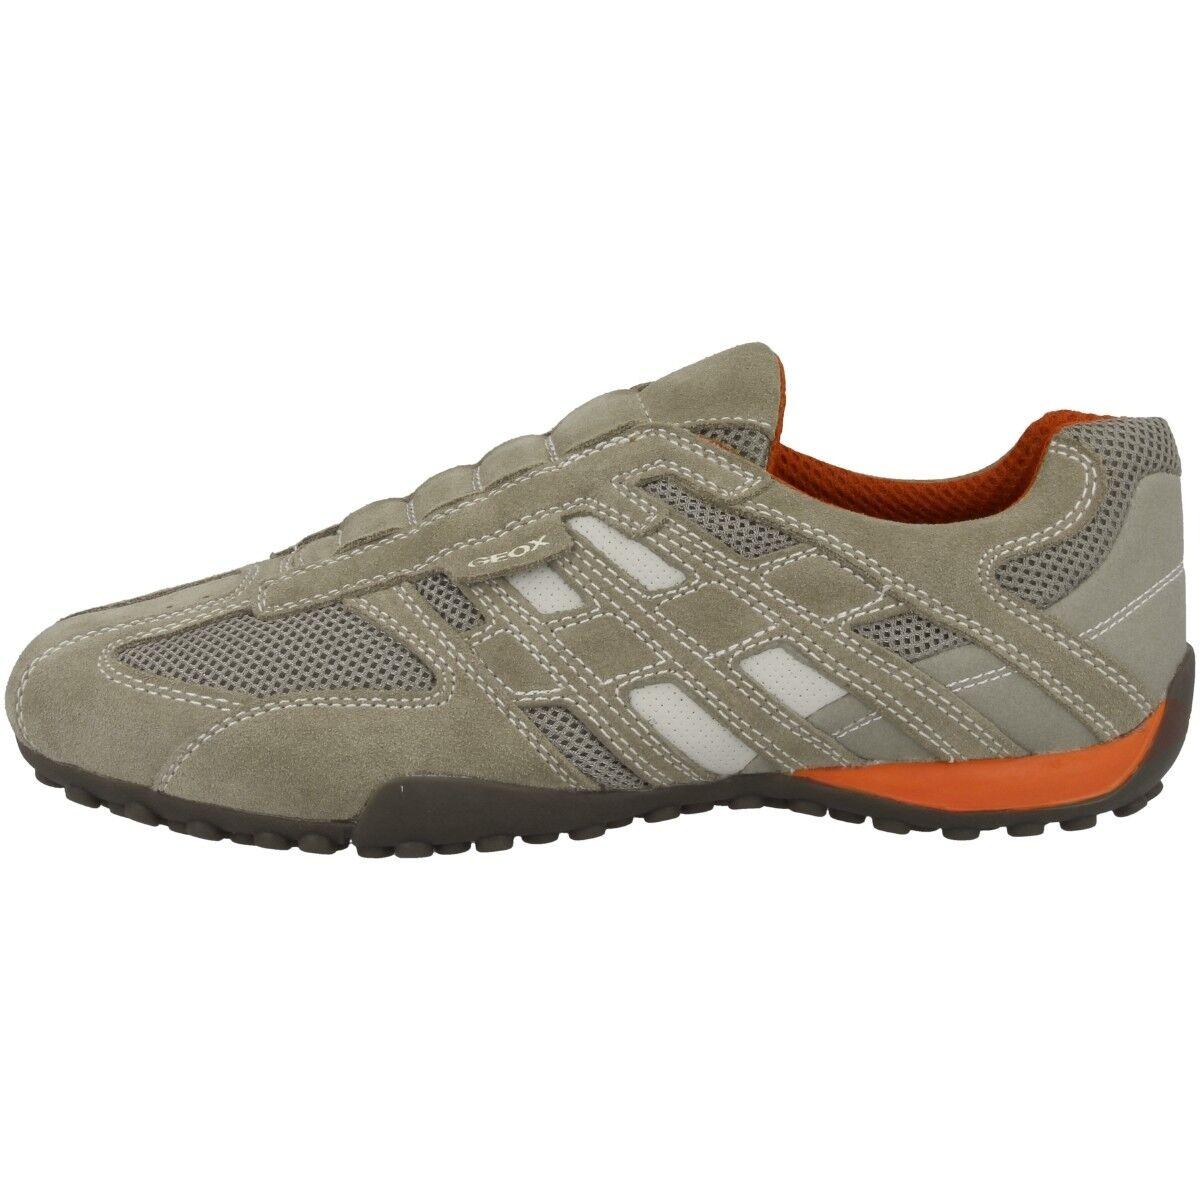 GEOX U Snake L Schuhe Herren Sneaker Halbschuhe beige orange U4207L02214C0845